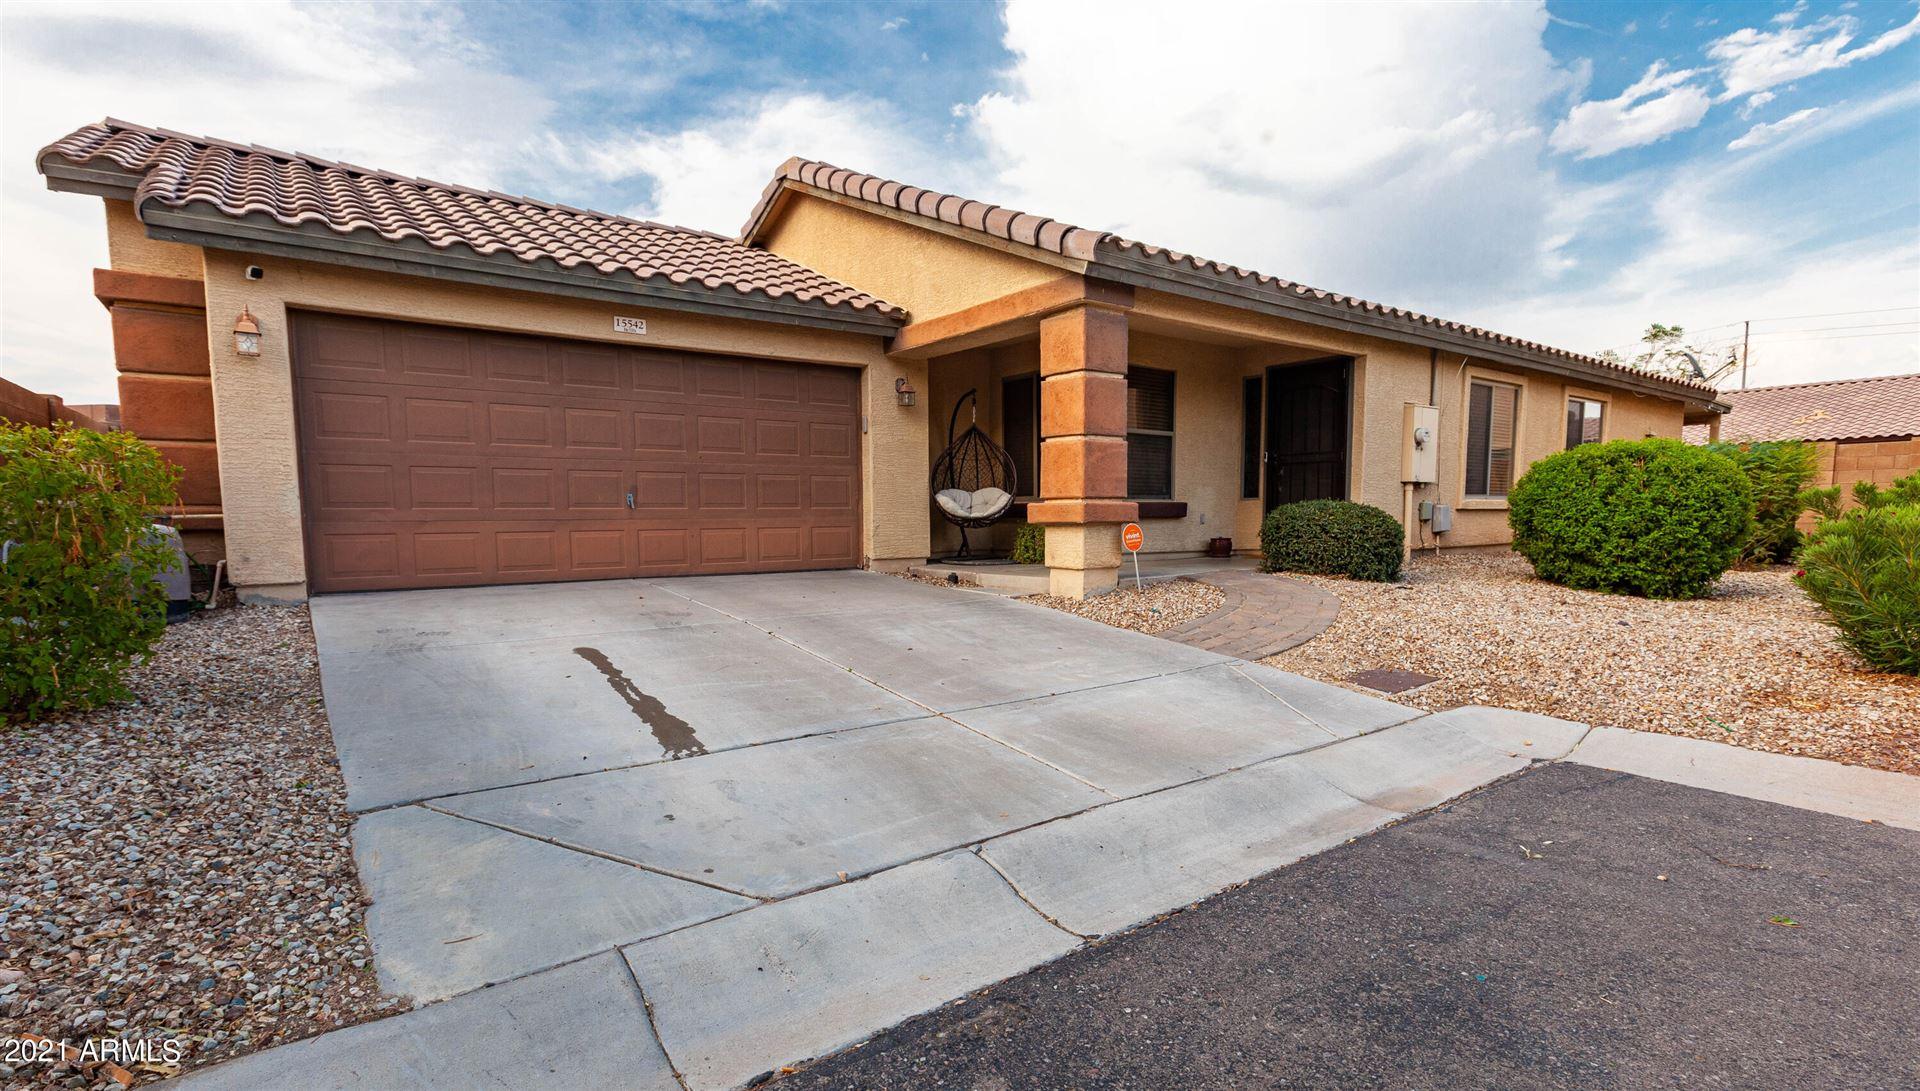 Photo of 15542 W SUPAI Circle, Goodyear, AZ 85338 (MLS # 6268664)